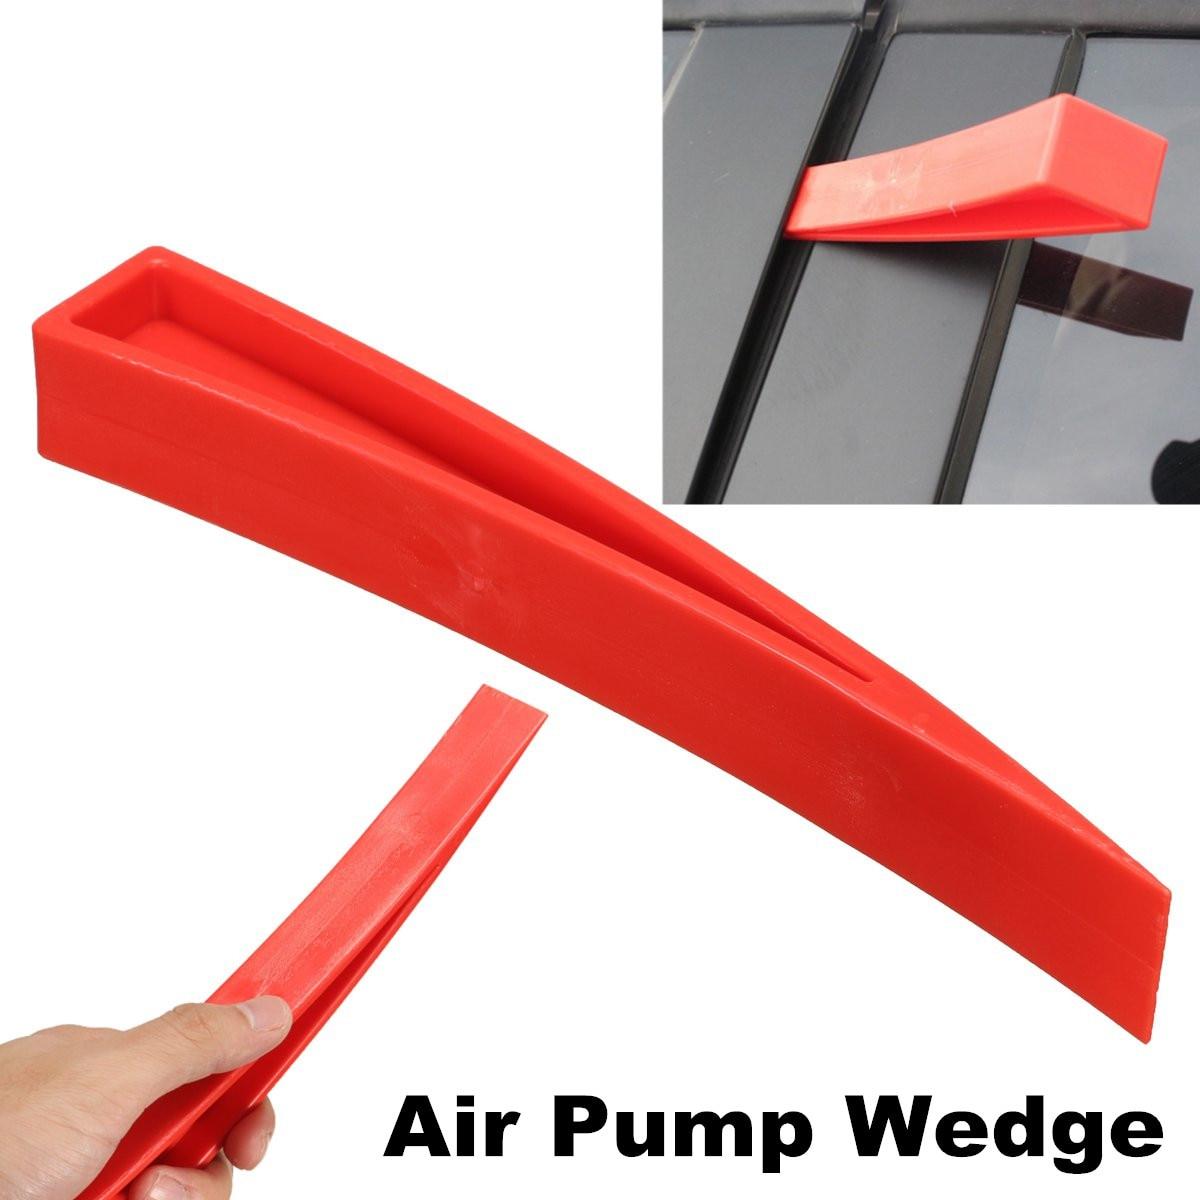 New Automotiv Air Pump Wedge Auto Repair Car Window Audio Doors Open Tools Red